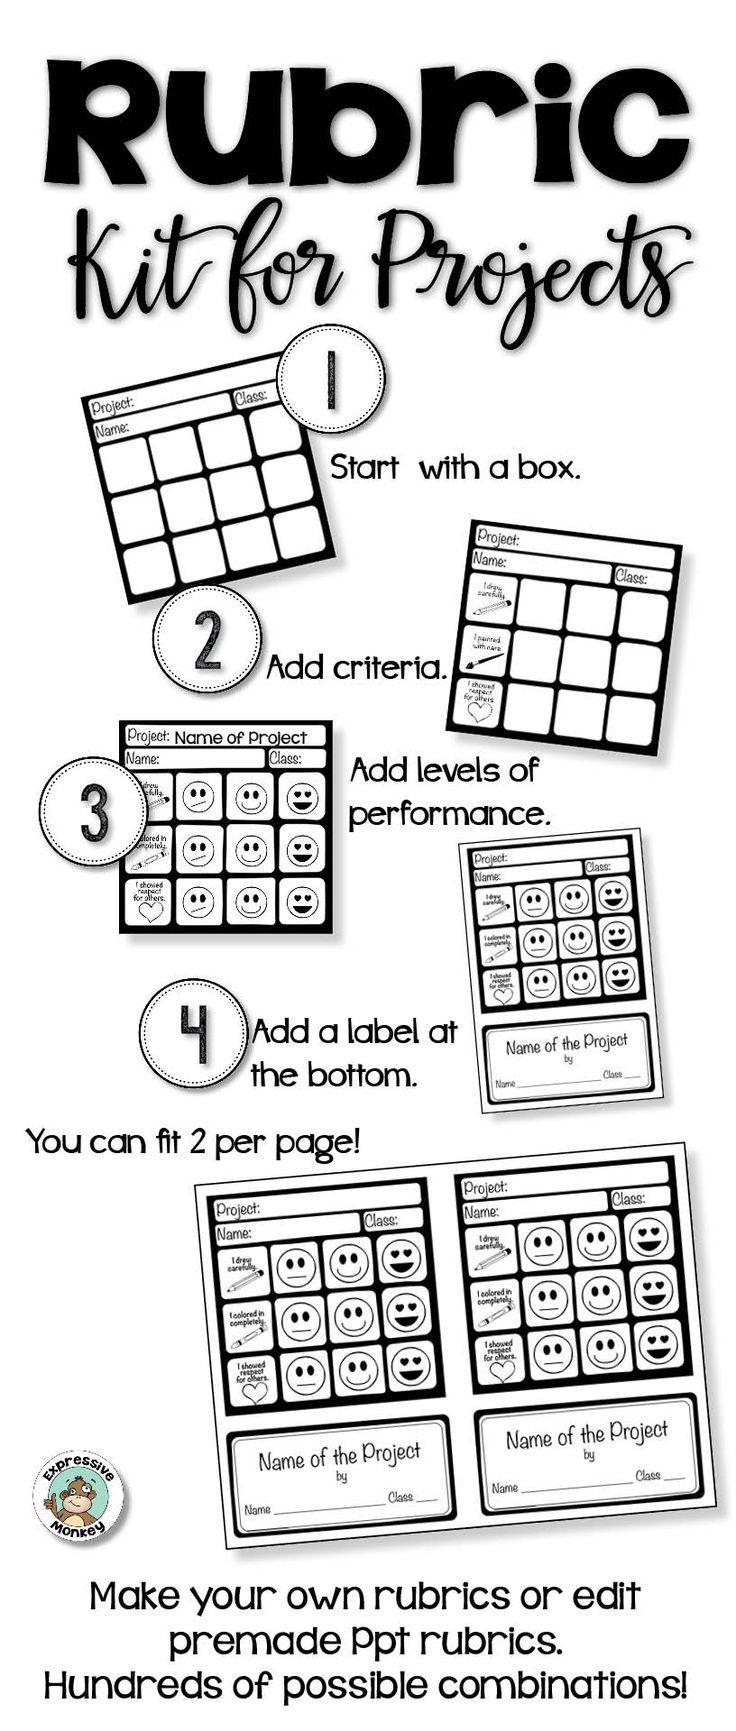 Make creating rubrics easier! - editable rubrics - rubrics in art education - student self-reflection - assessments for elementary art -